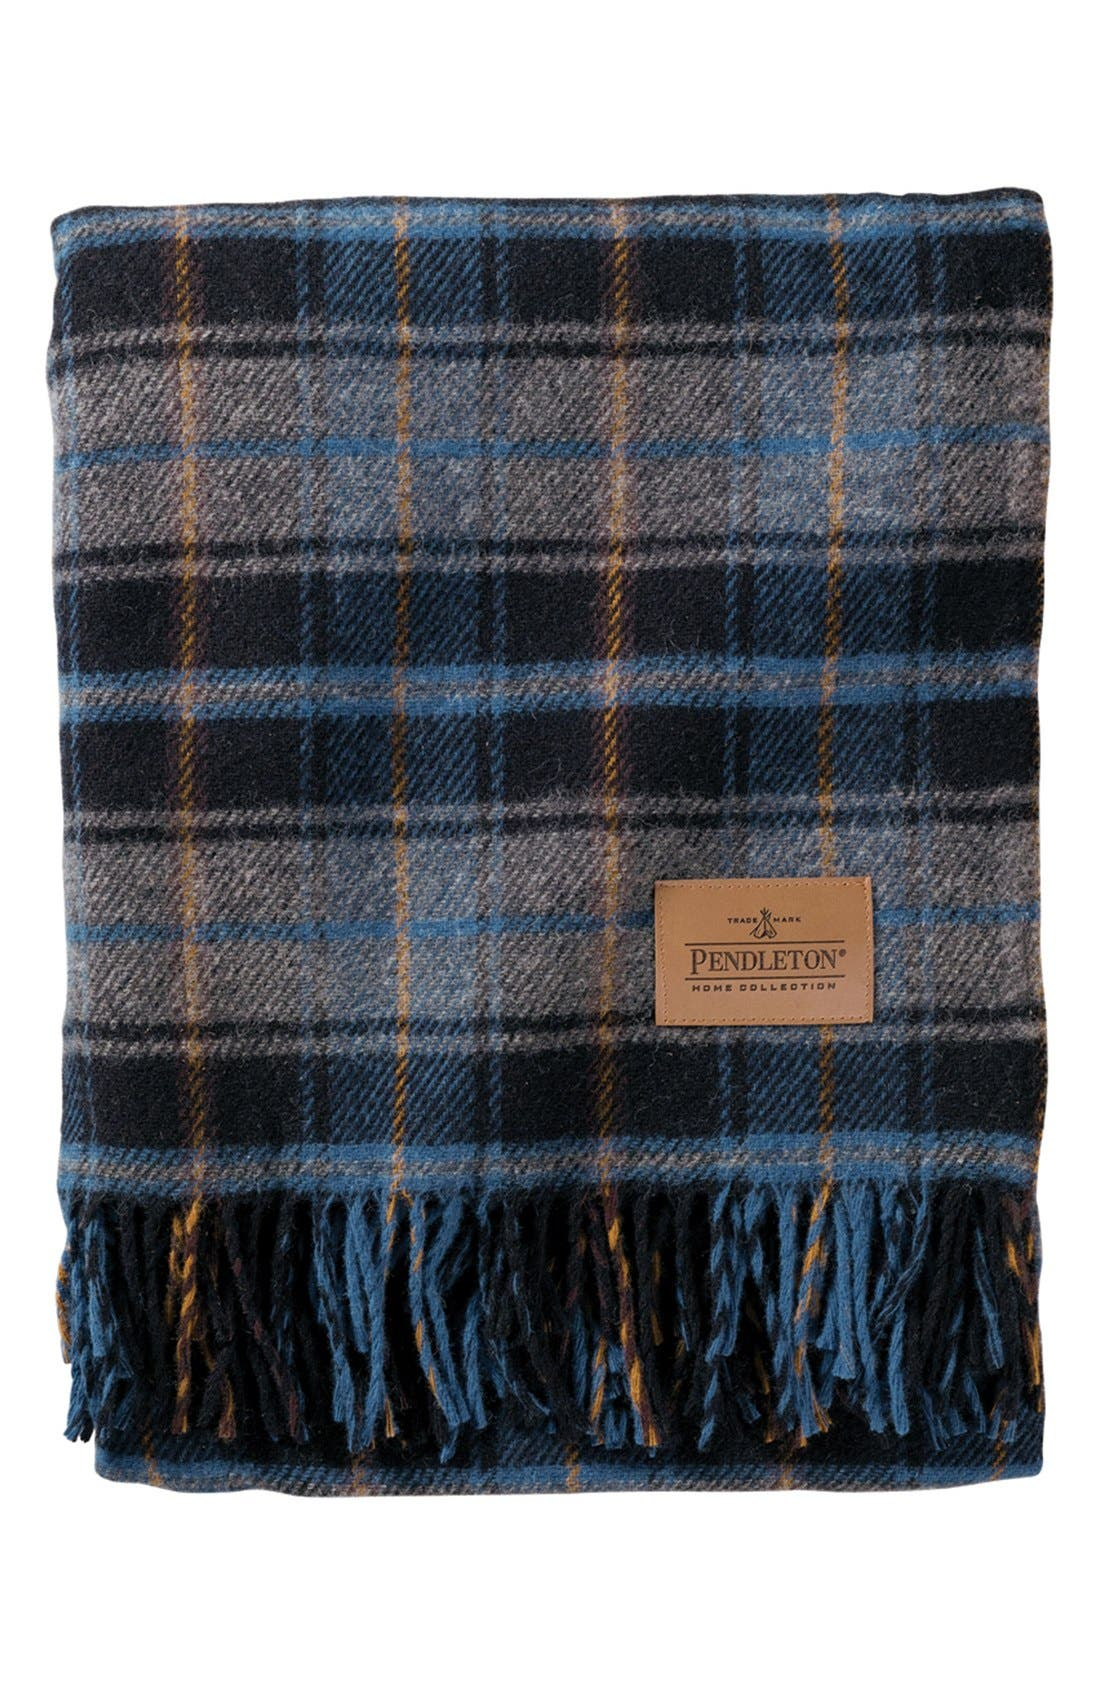 Alternate Image 1 Selected - Pendleton 'Motor Robe' Wool Stadium Blanket with Carrier